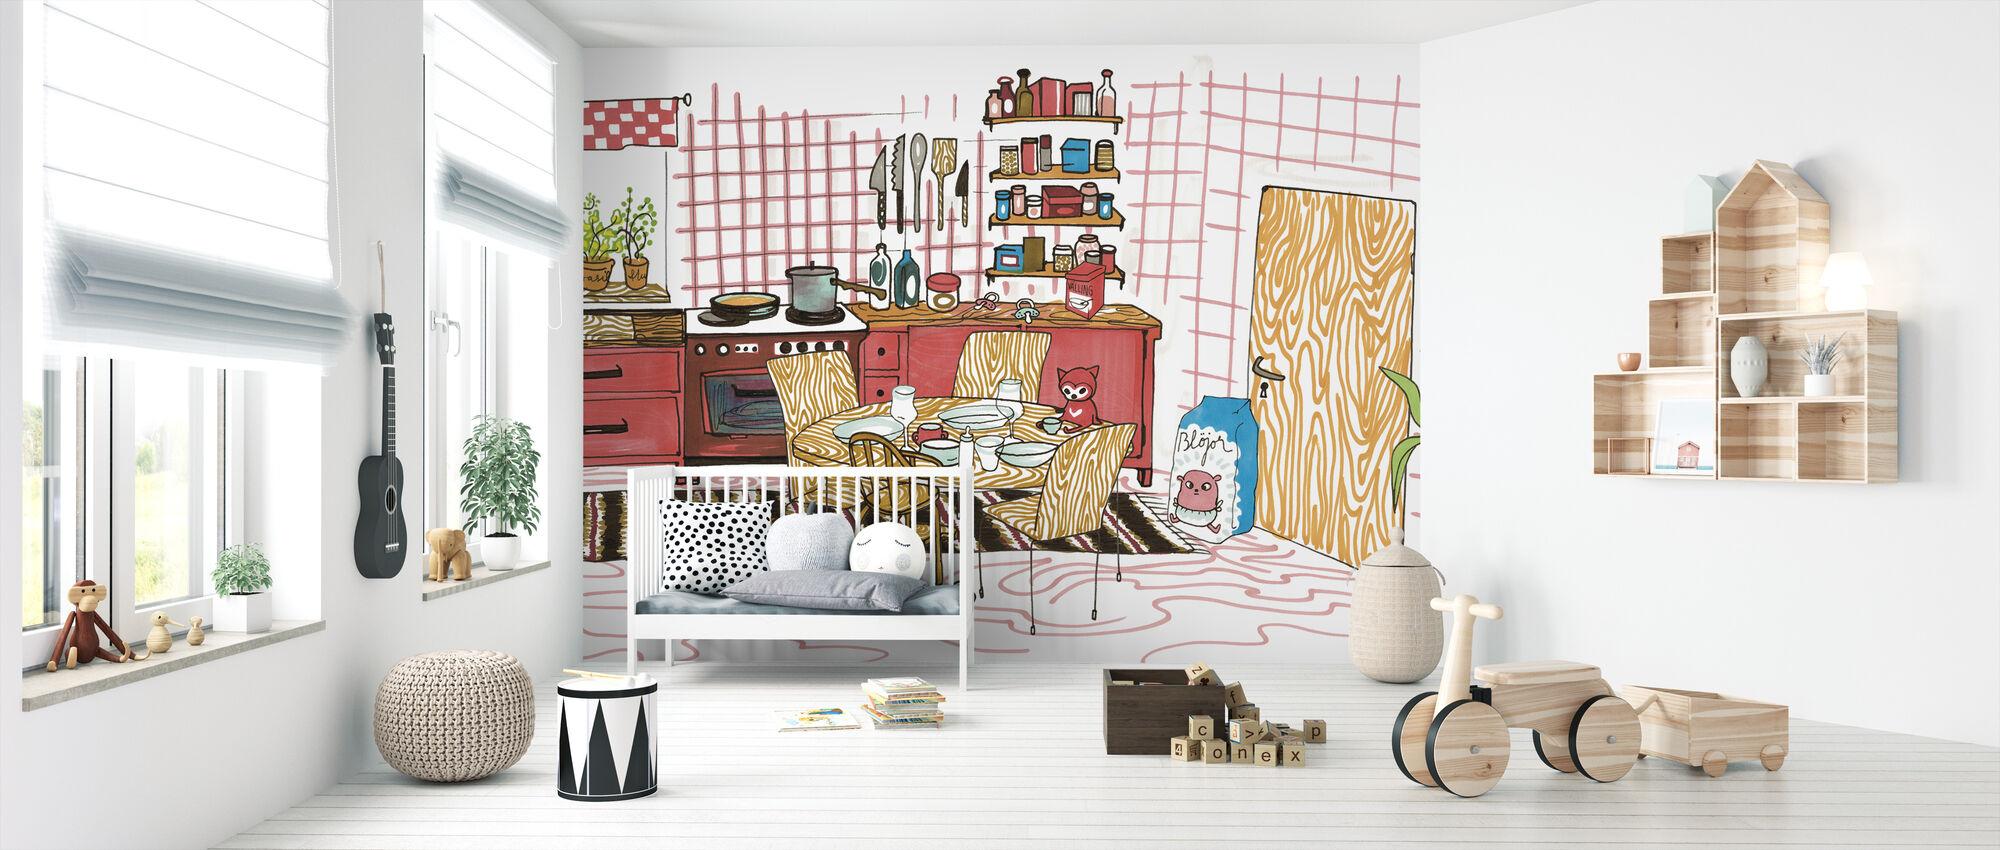 Cat's house - Wallpaper - Nursery